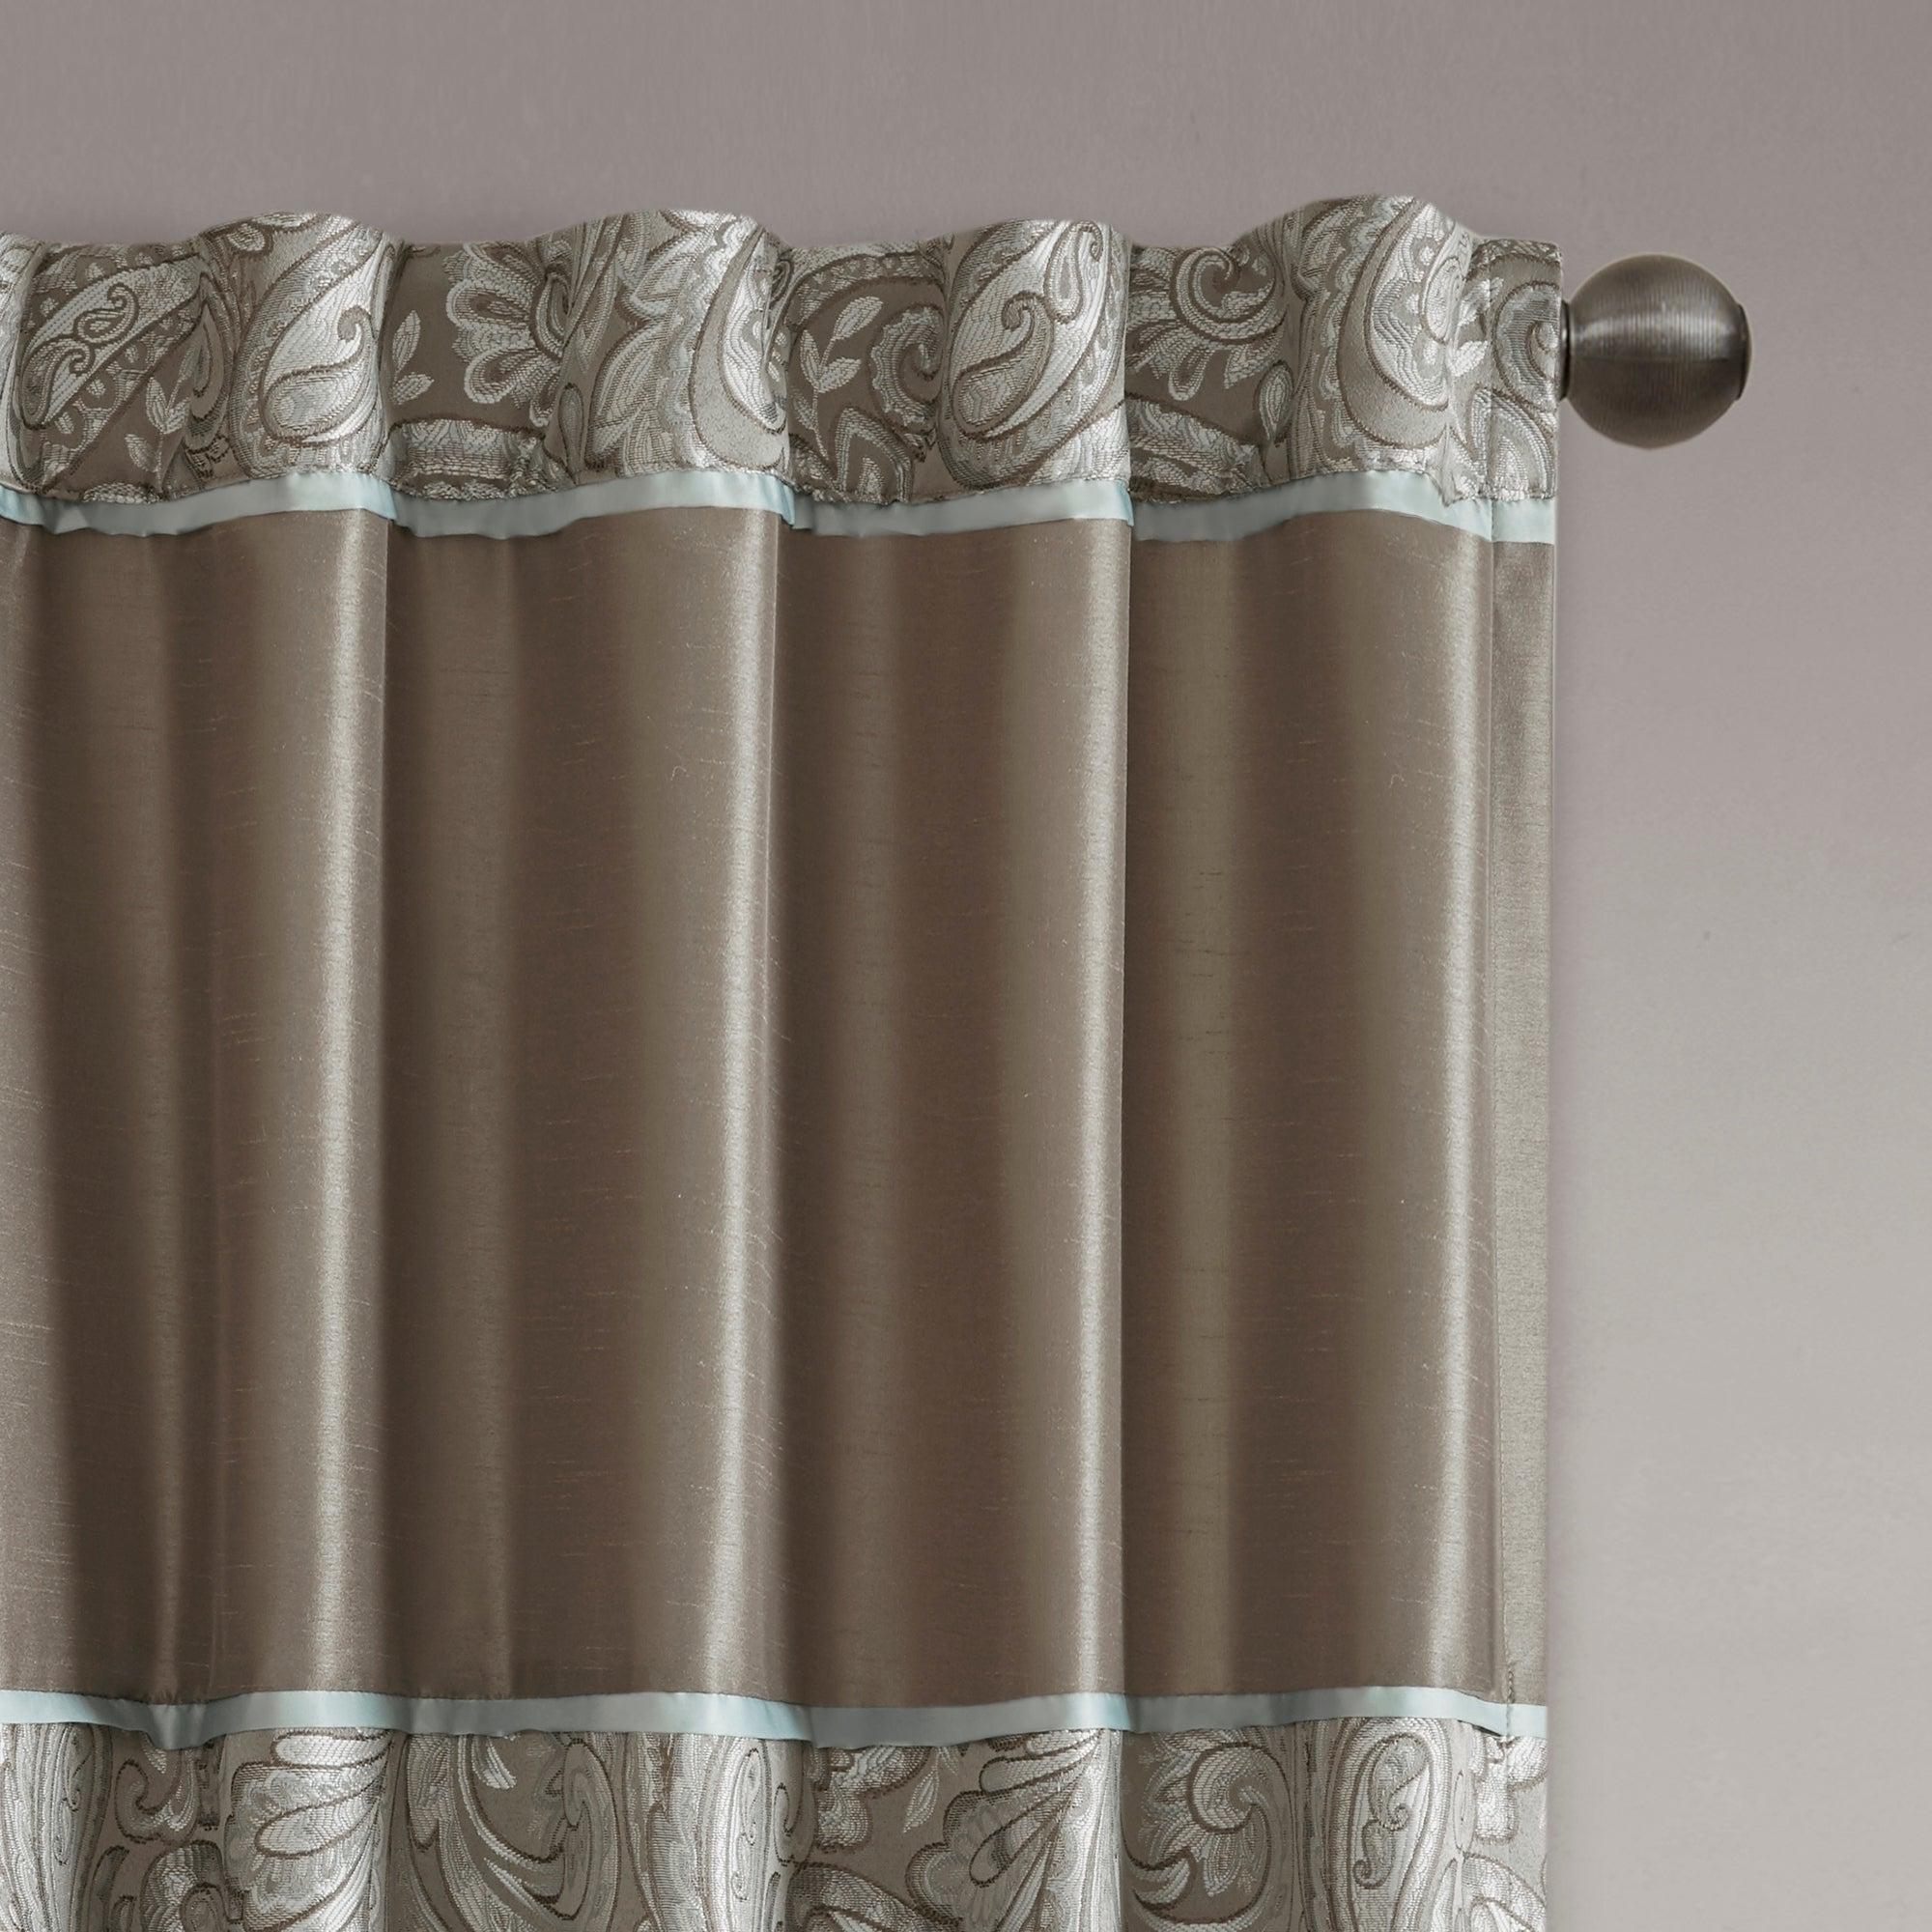 Newest Madison Park Whitman Curtain Panel Pair Throughout Whitman Curtain Panel Pairs (View 4 of 20)